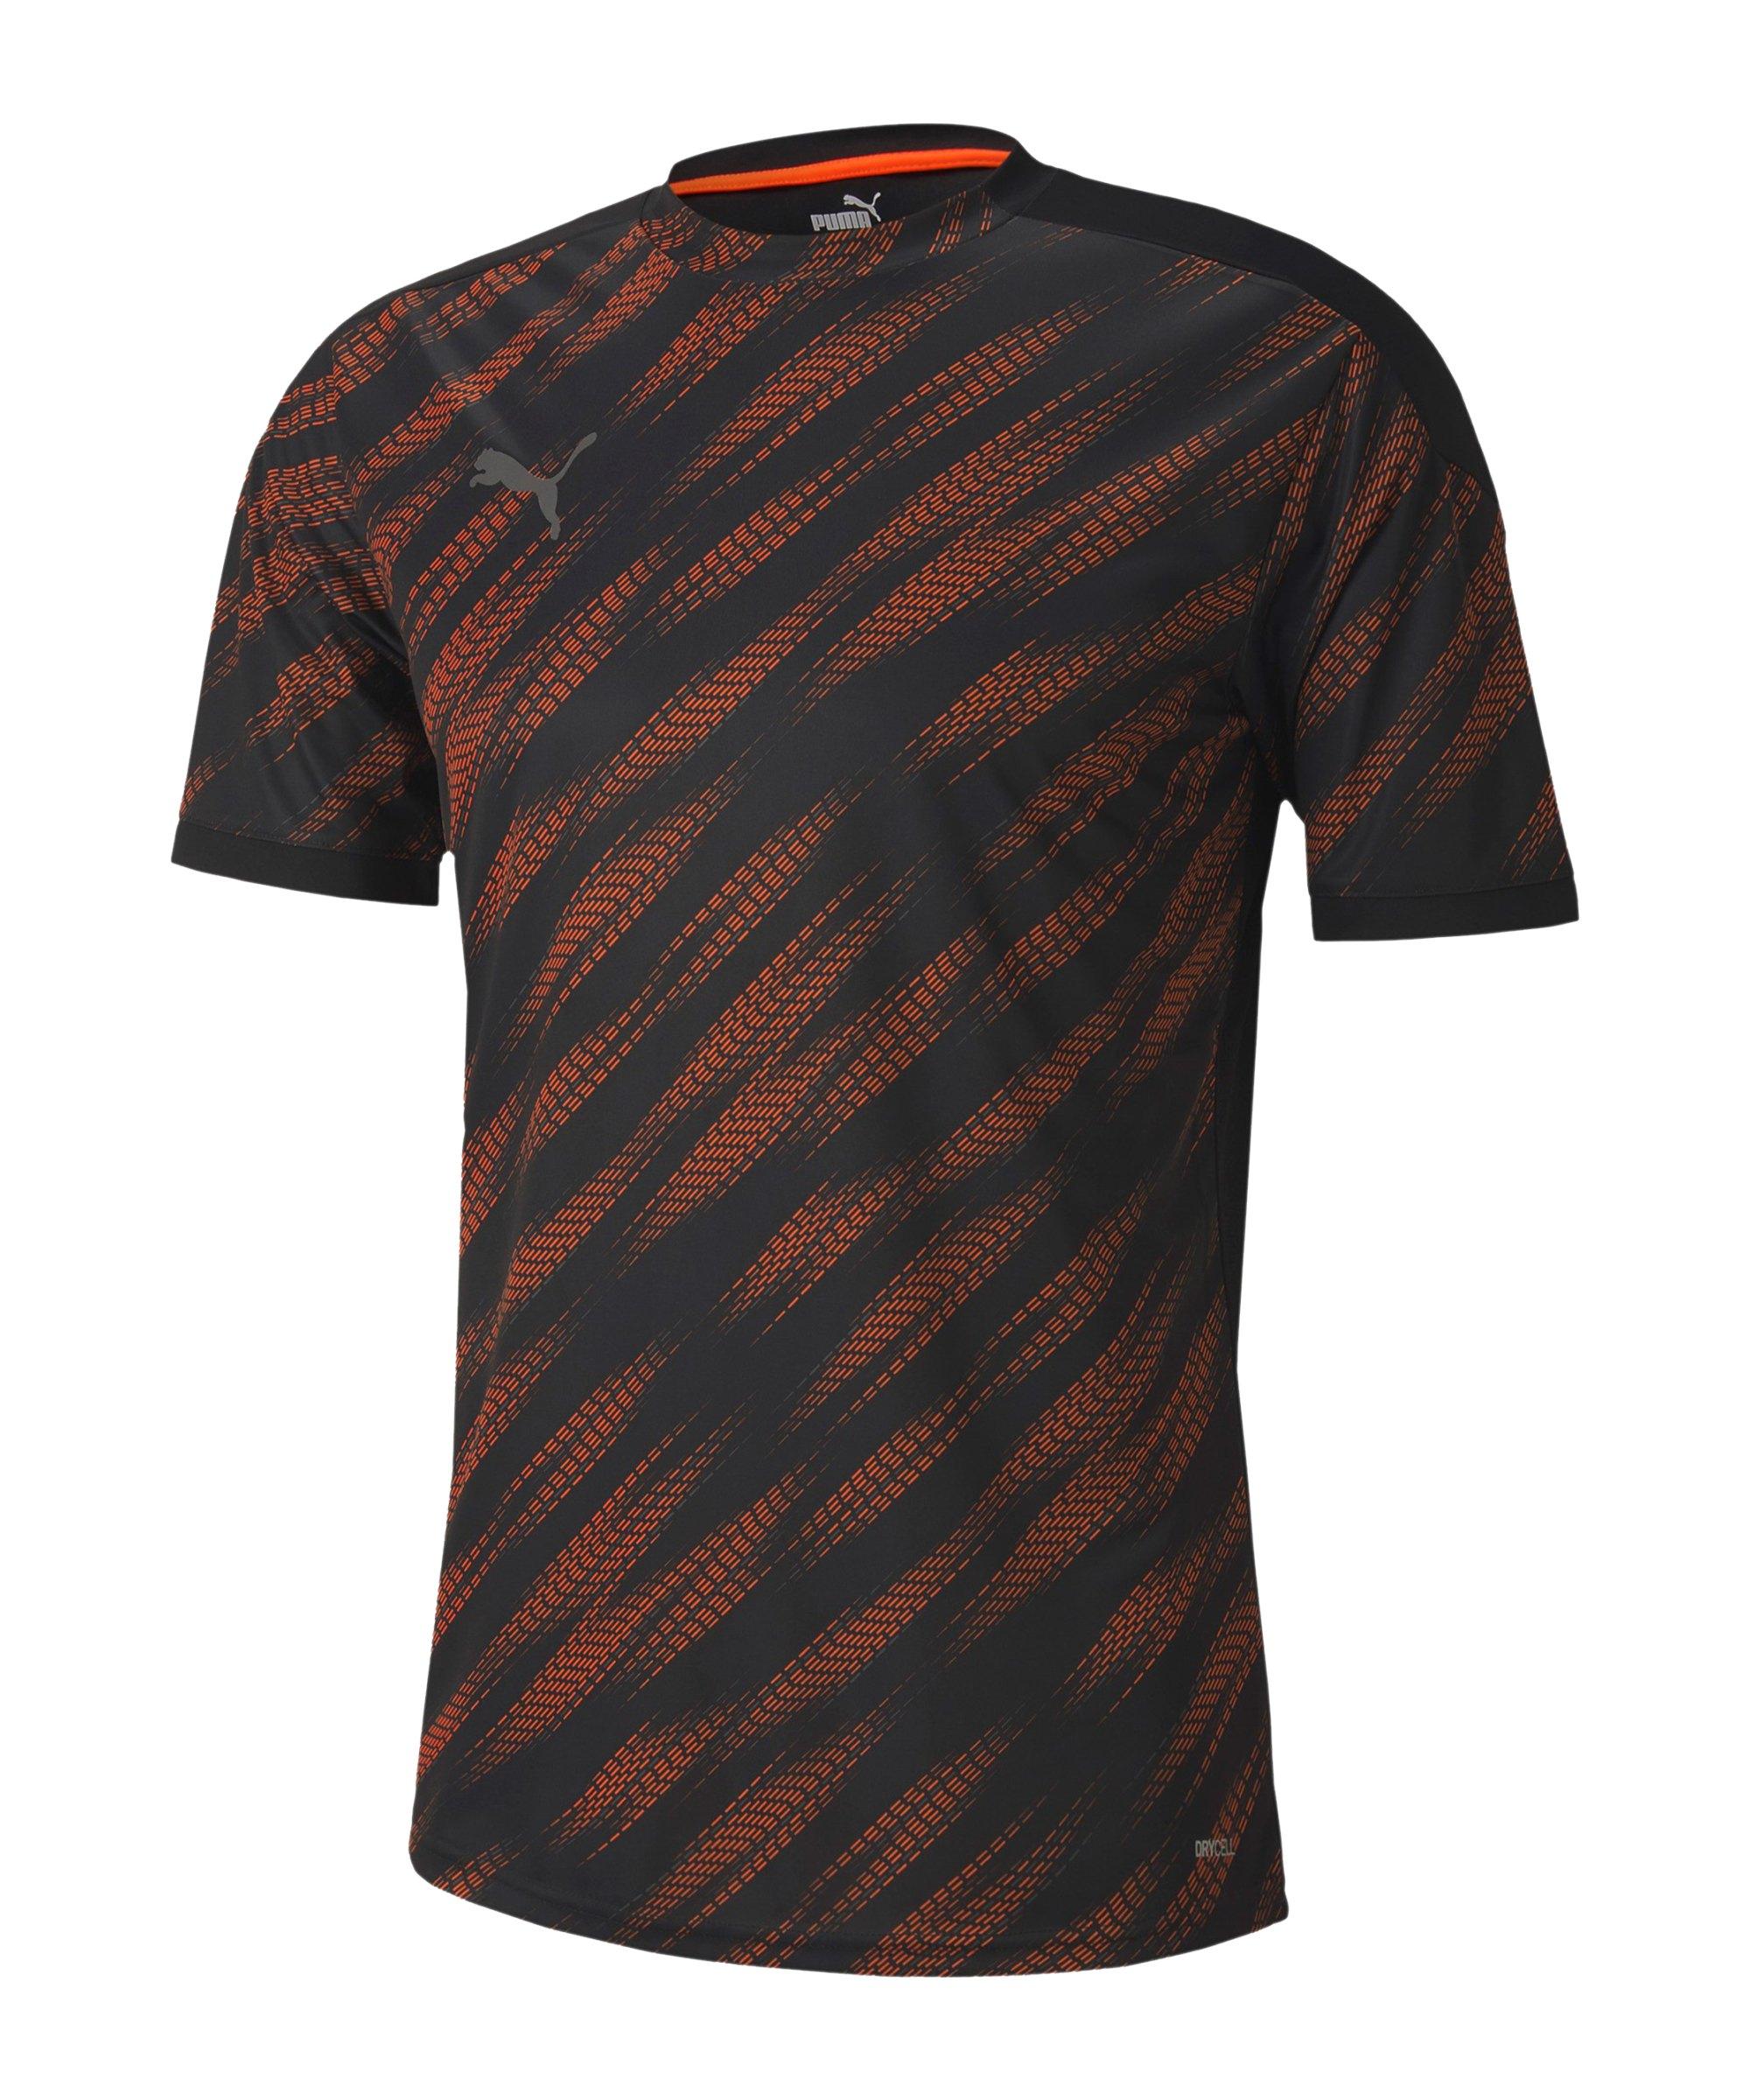 PUMA ftblNXT Graphic T-Shirt Schwarz F01 - schwarz